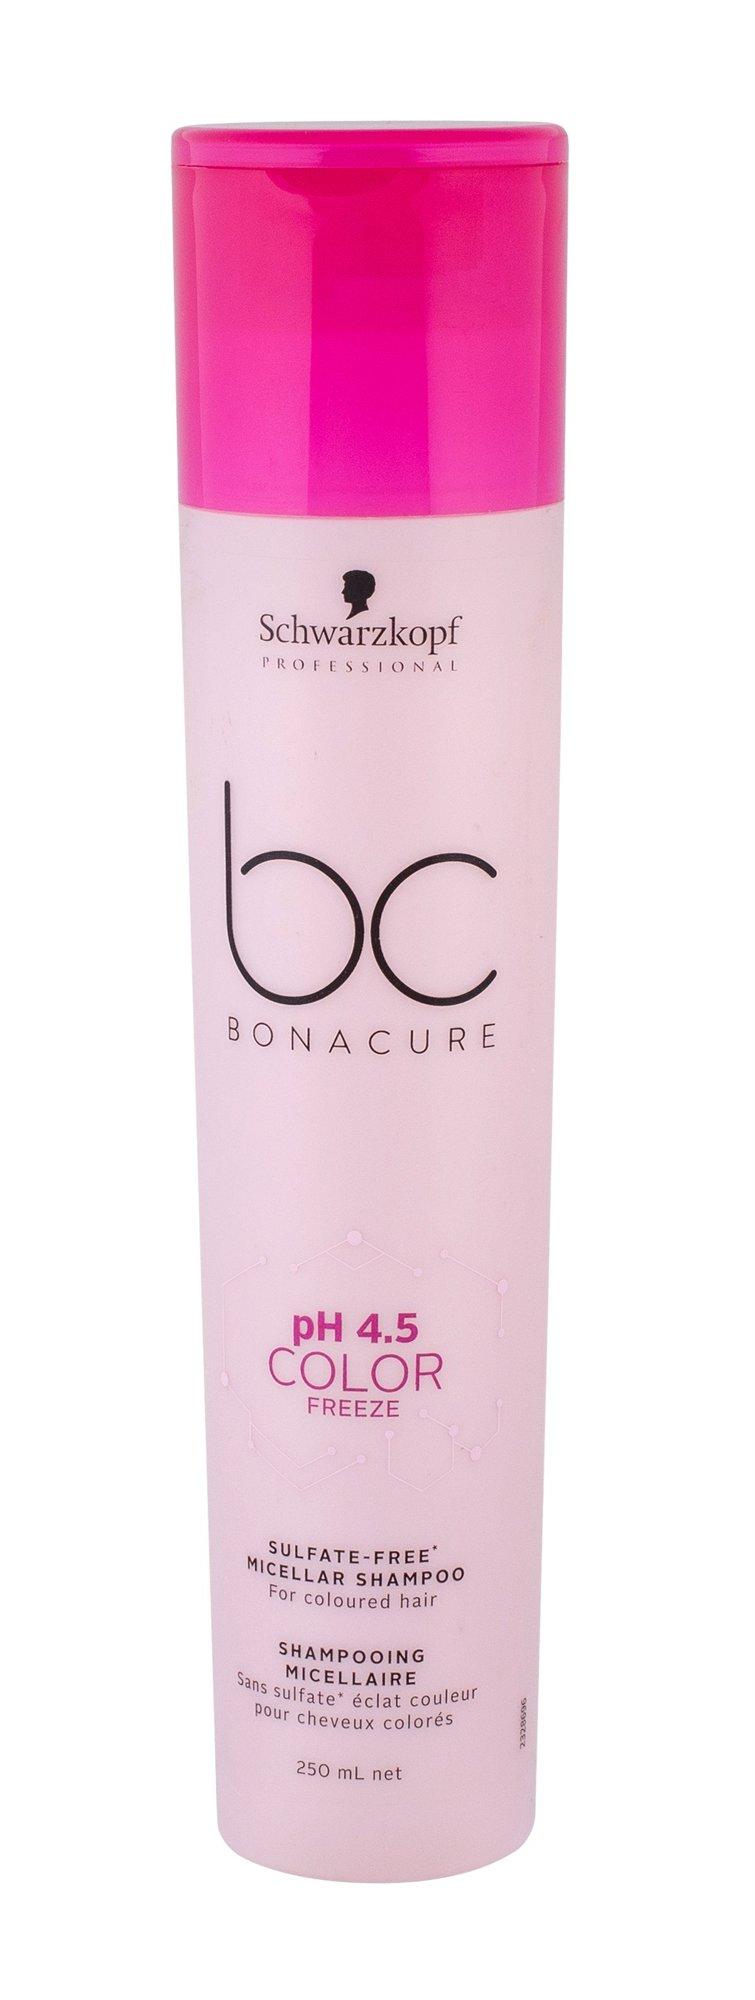 Schwarzkopf Professional BC Bonacure pH 4.5 Color Freeze Shampoo 250ml